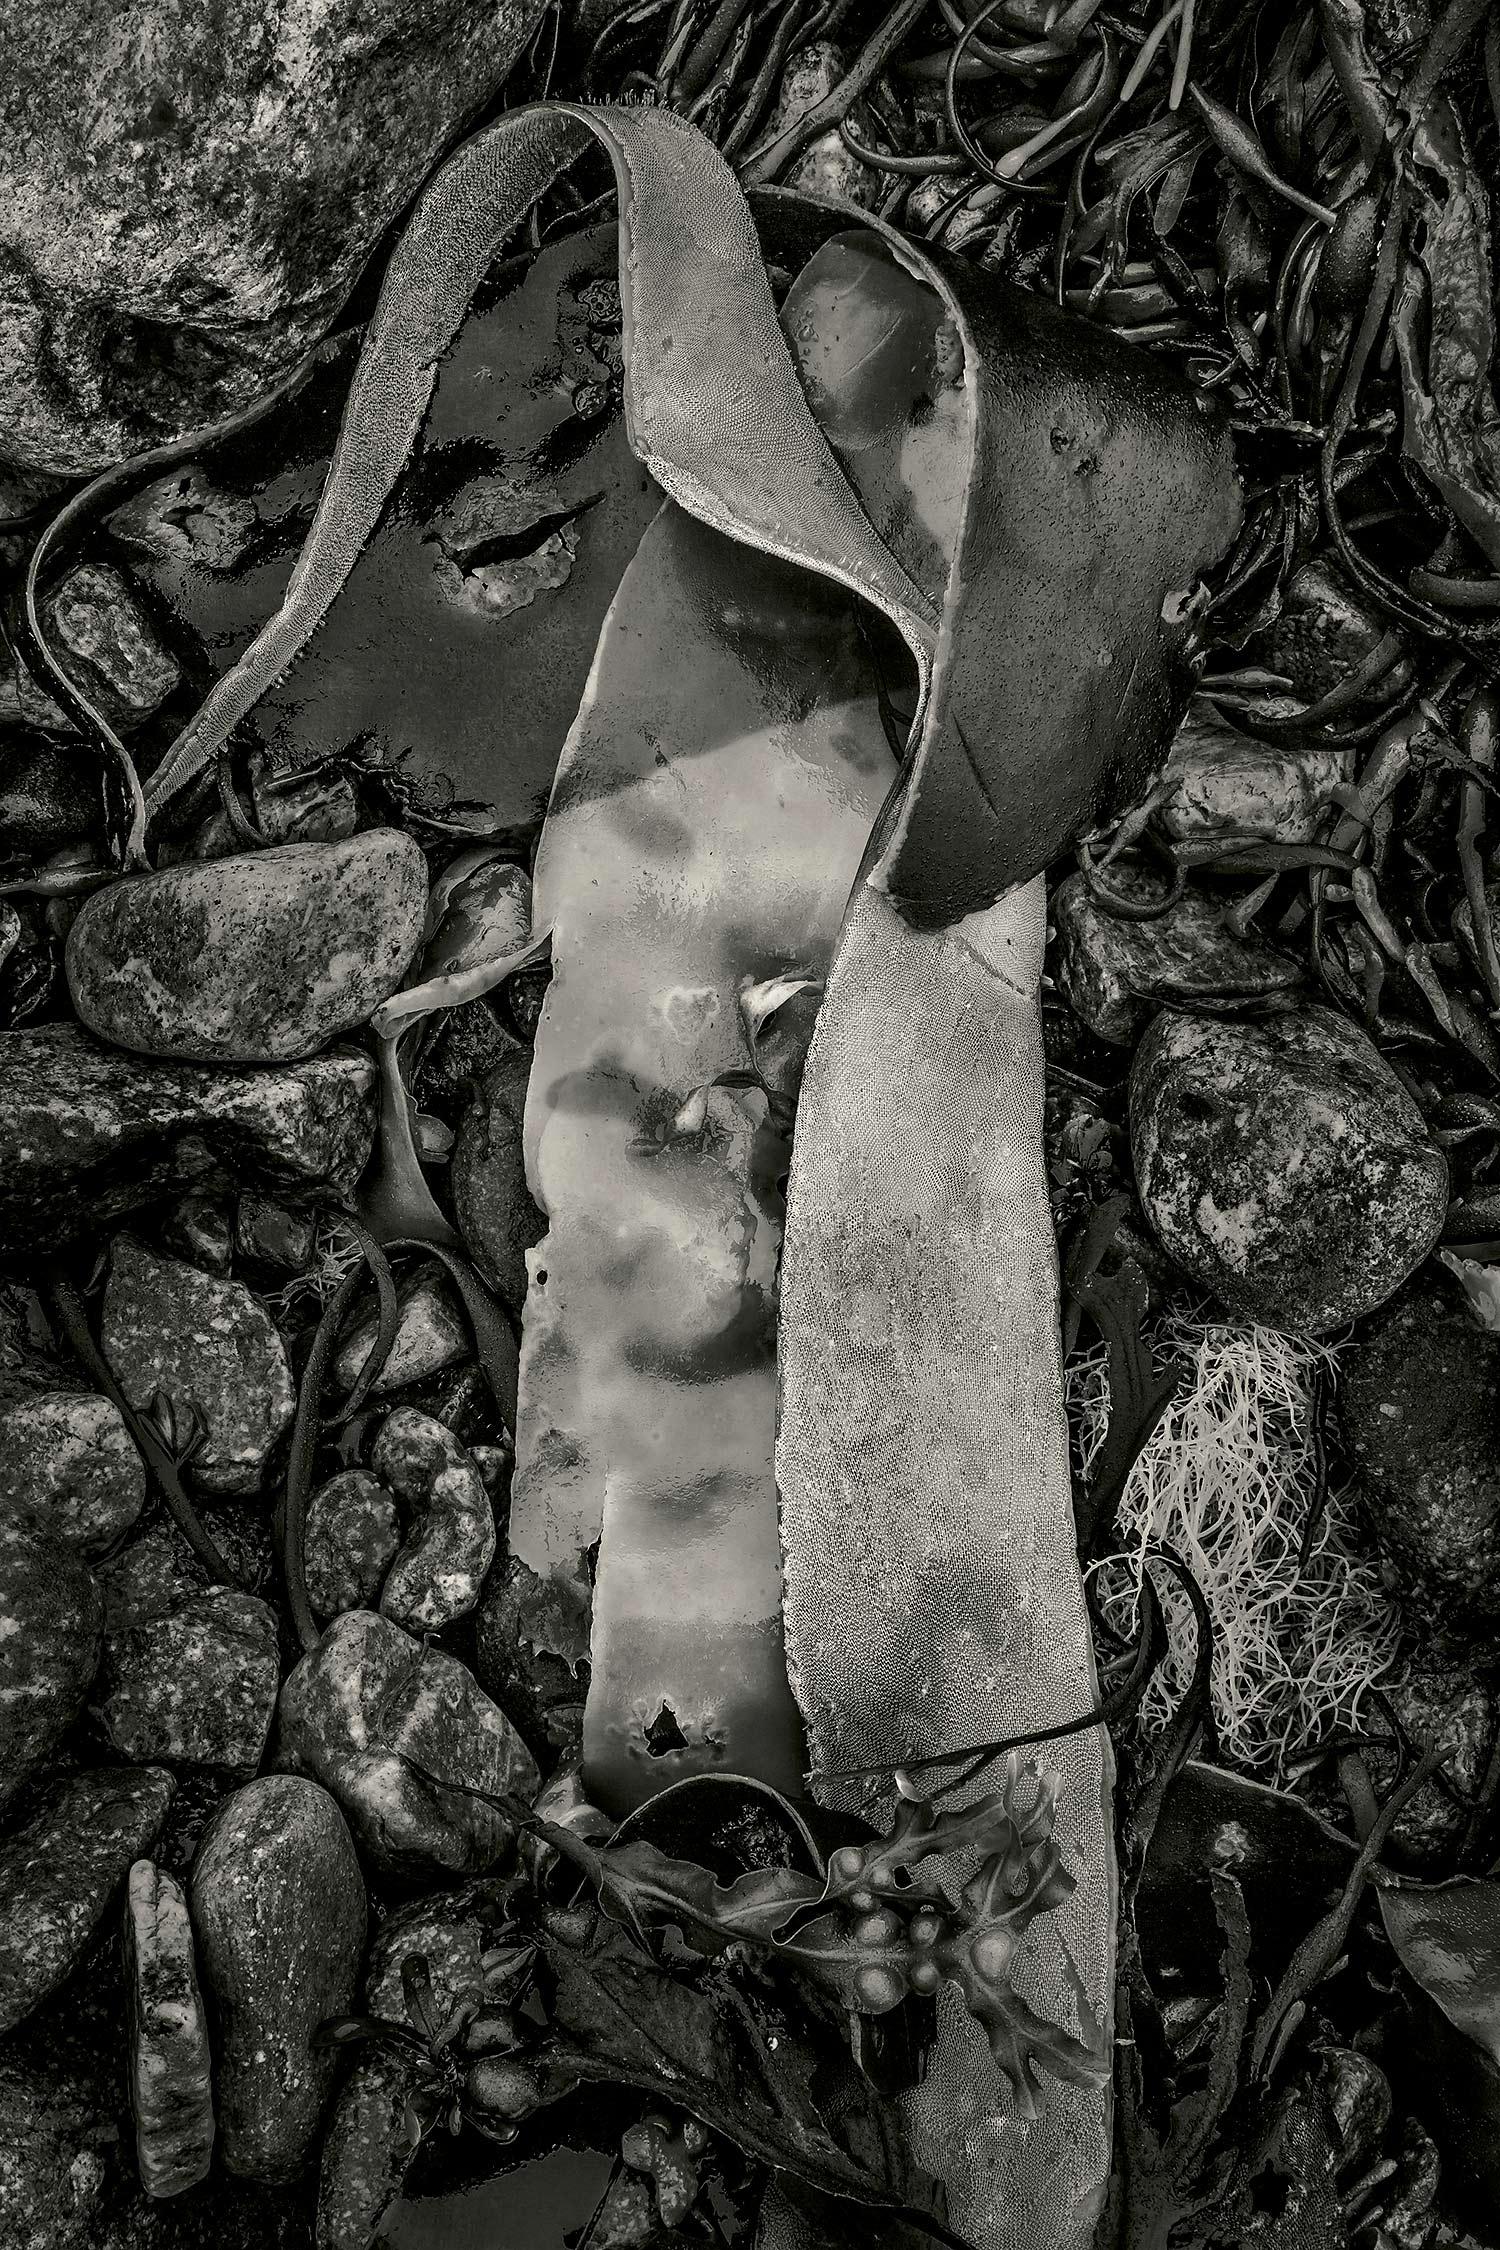 Seaweed 552, Seawall, Maine, 2012